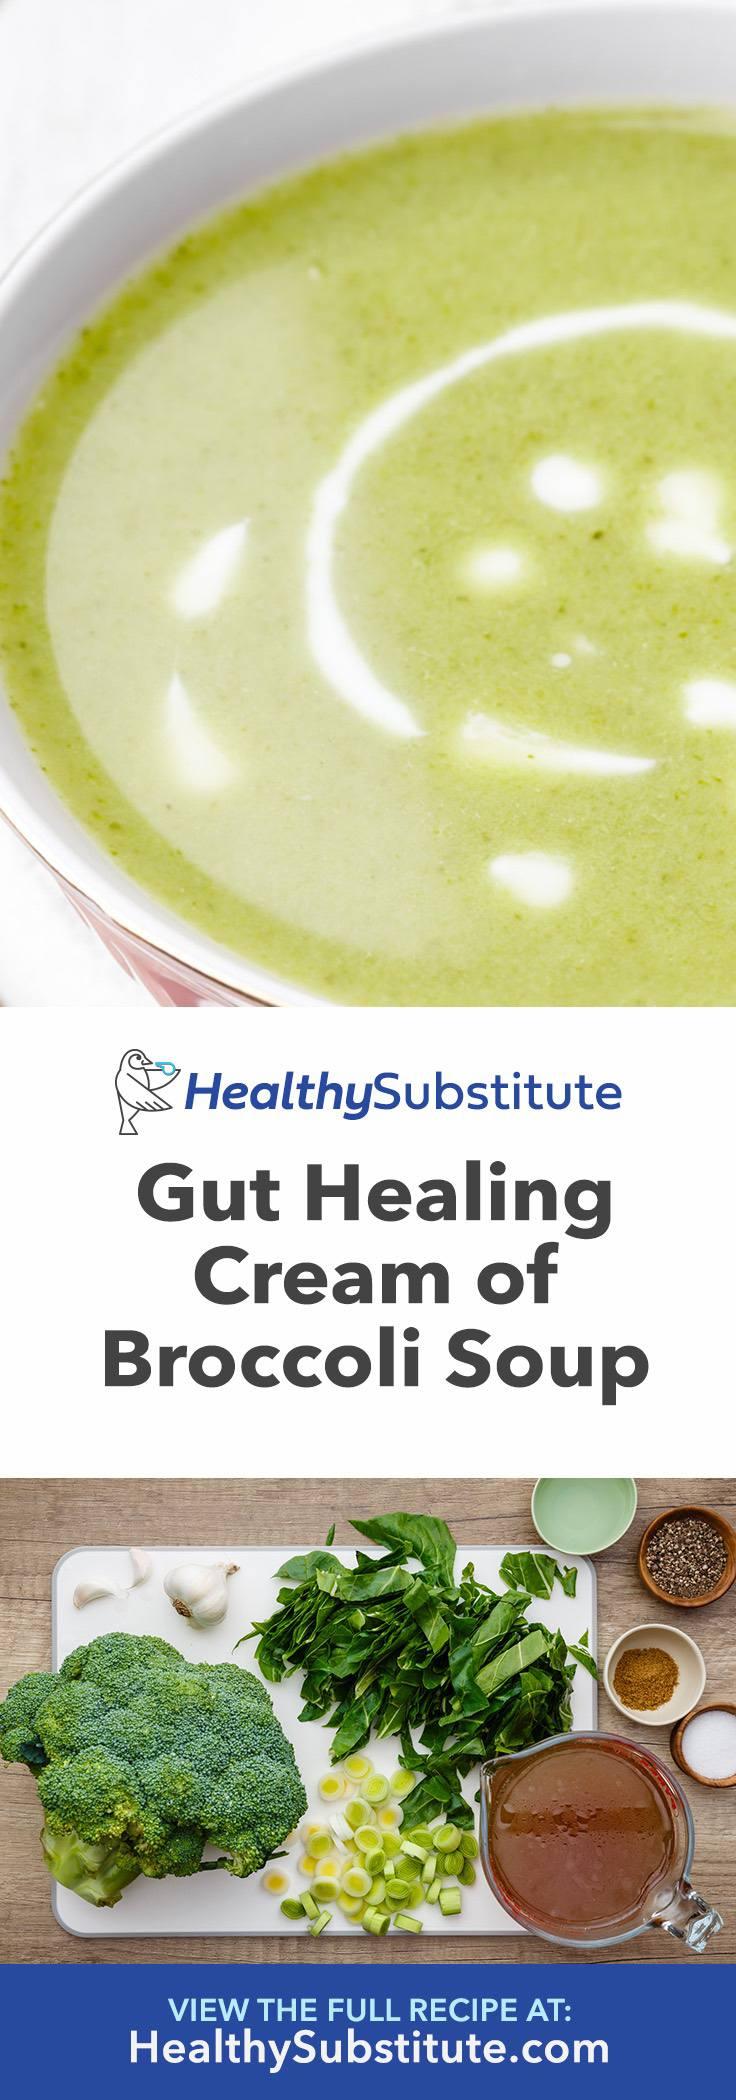 Gut Healing Cream of Broccoli Soup